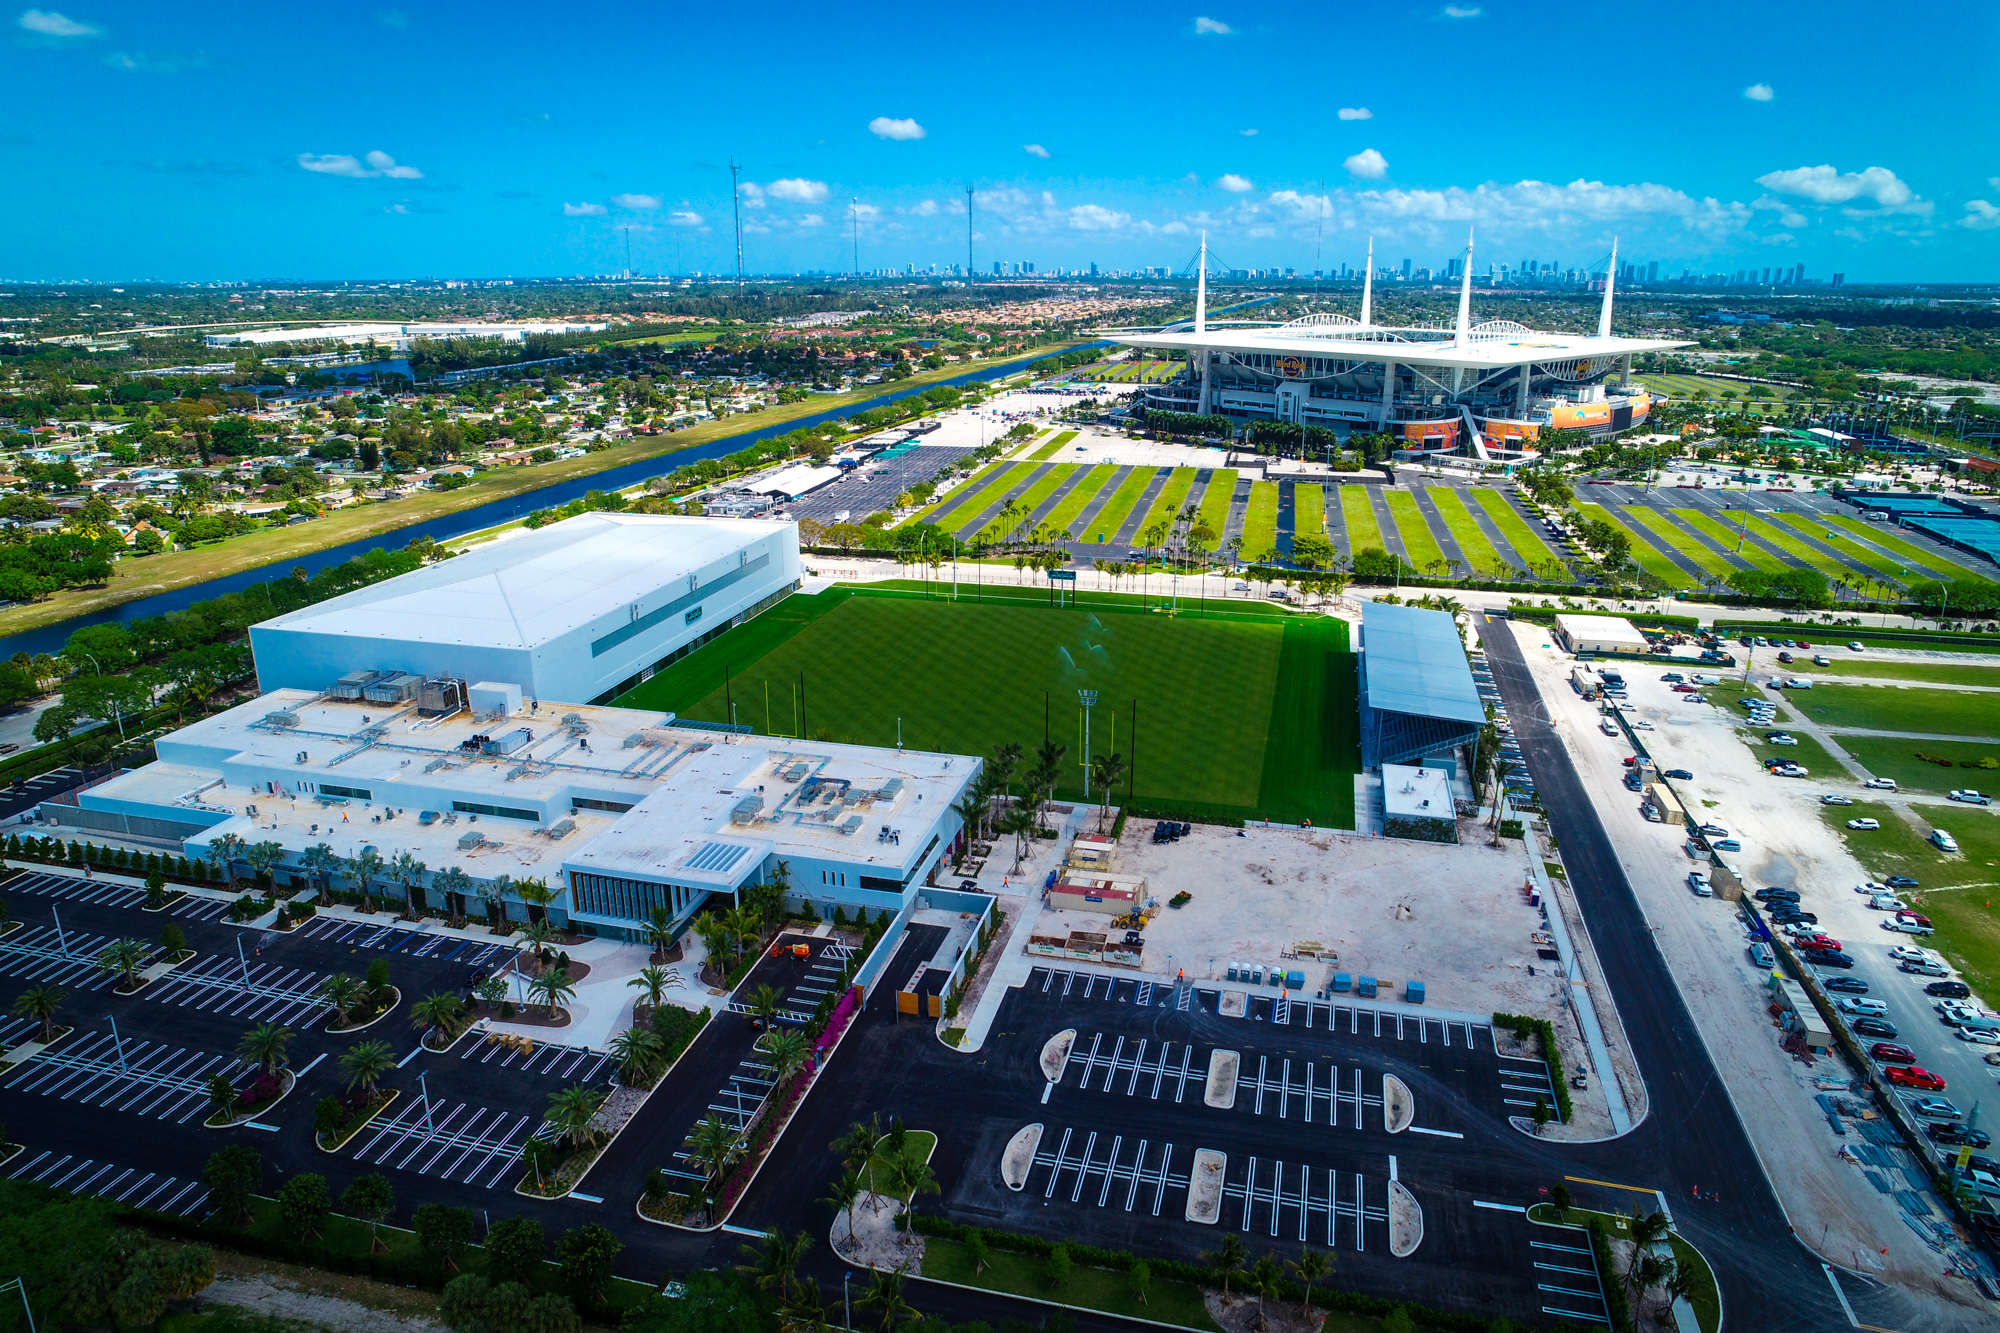 2021-03-12-8679-Miami-Dolphins-Practice-Facility-55.jpg